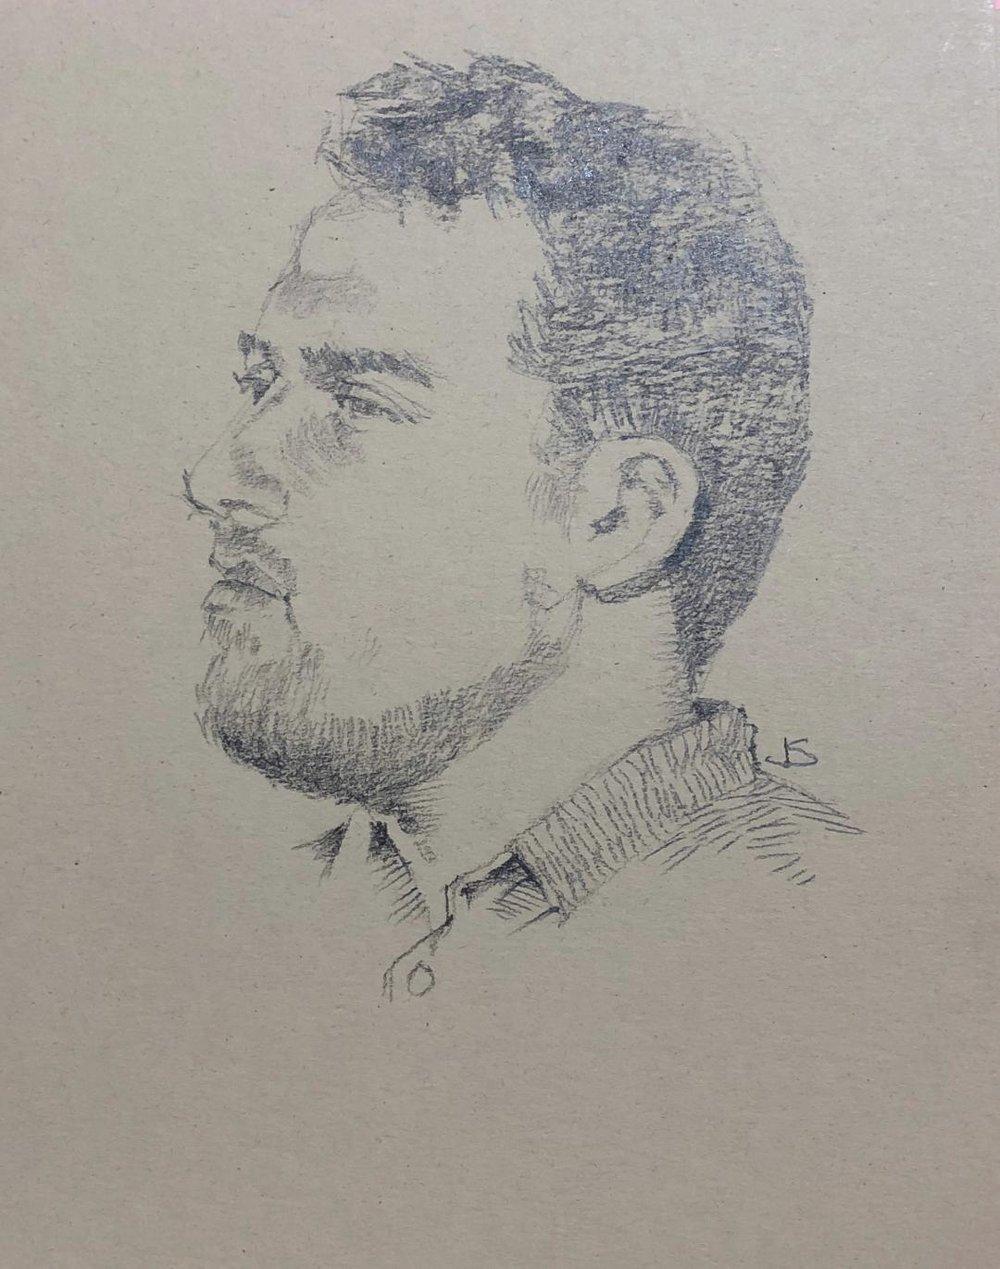 Jeff Suntala did this drawing.